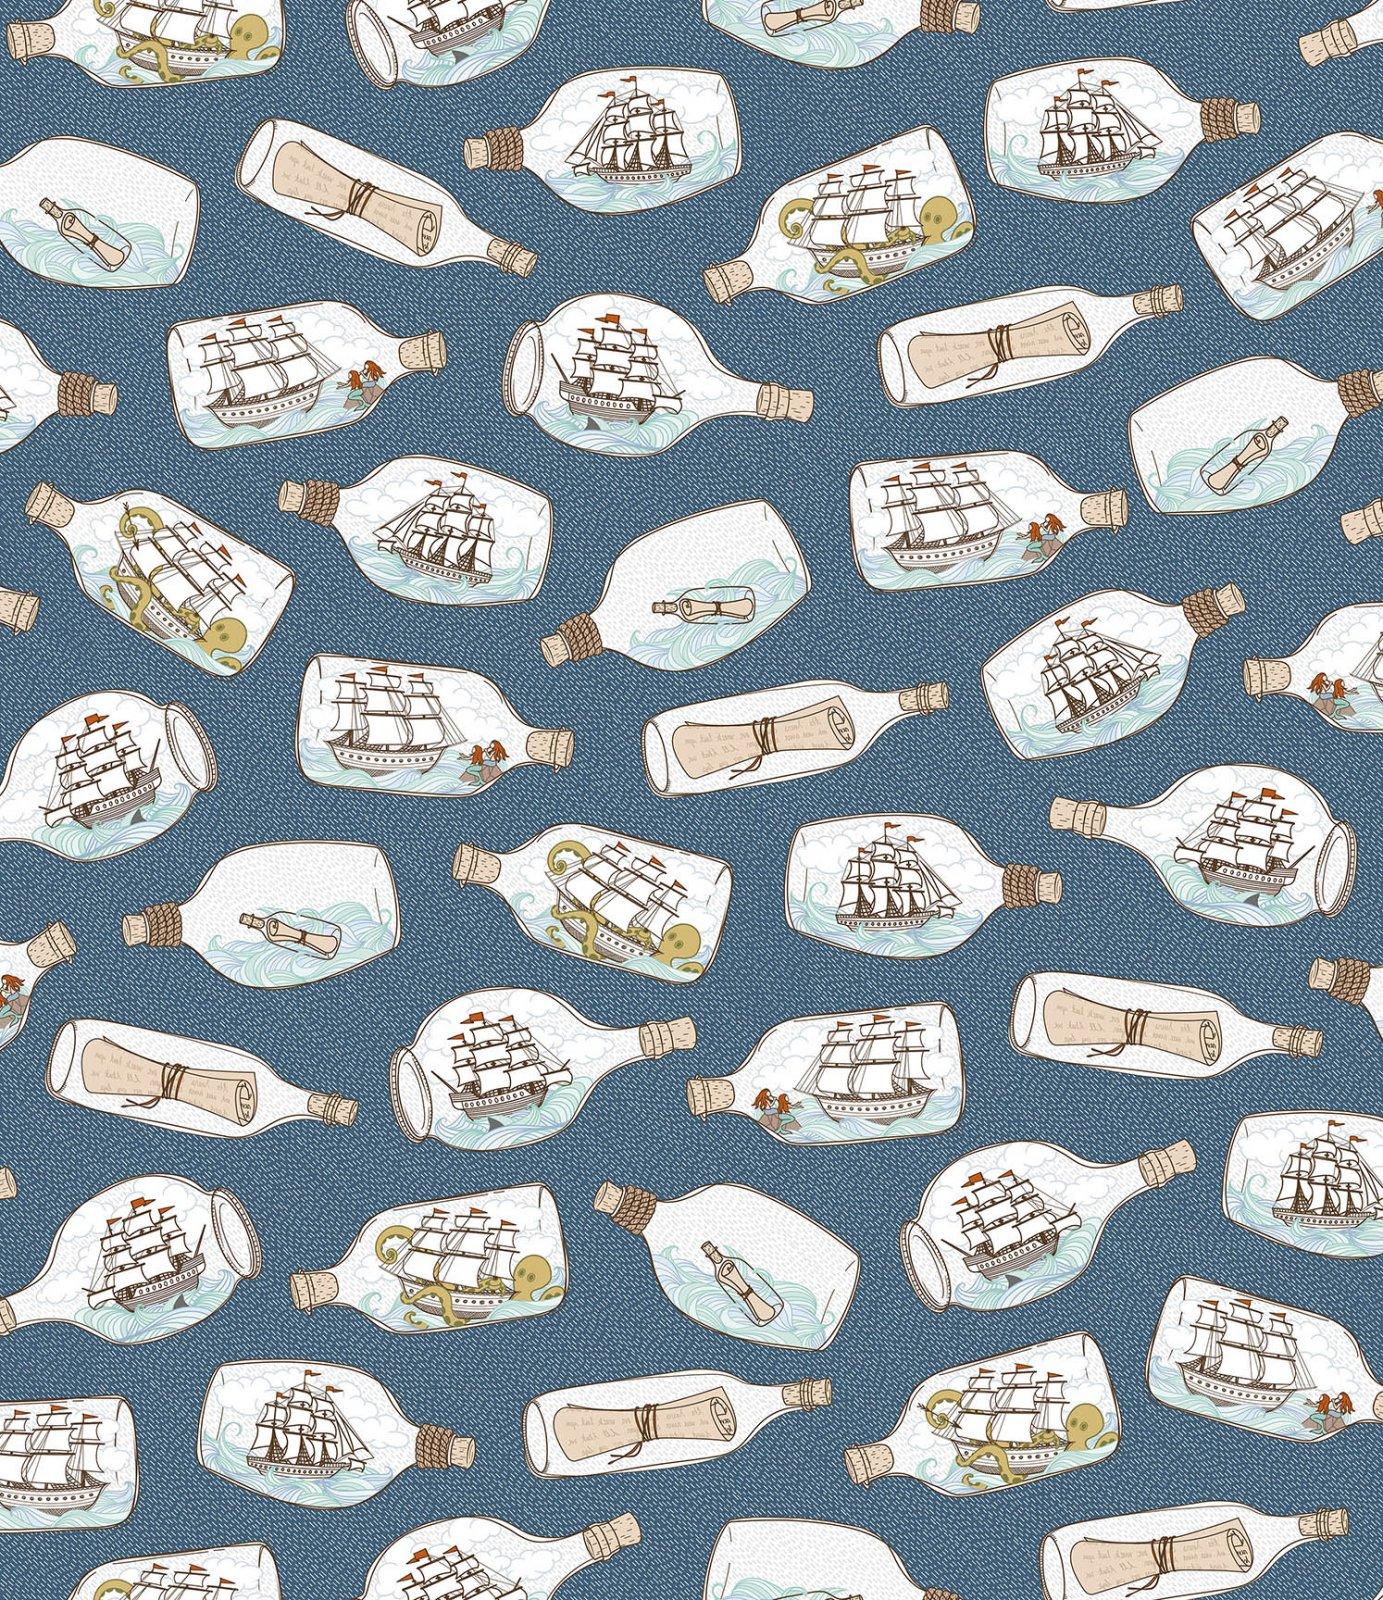 In Deep Ship - Ships in Bottles - Ocean